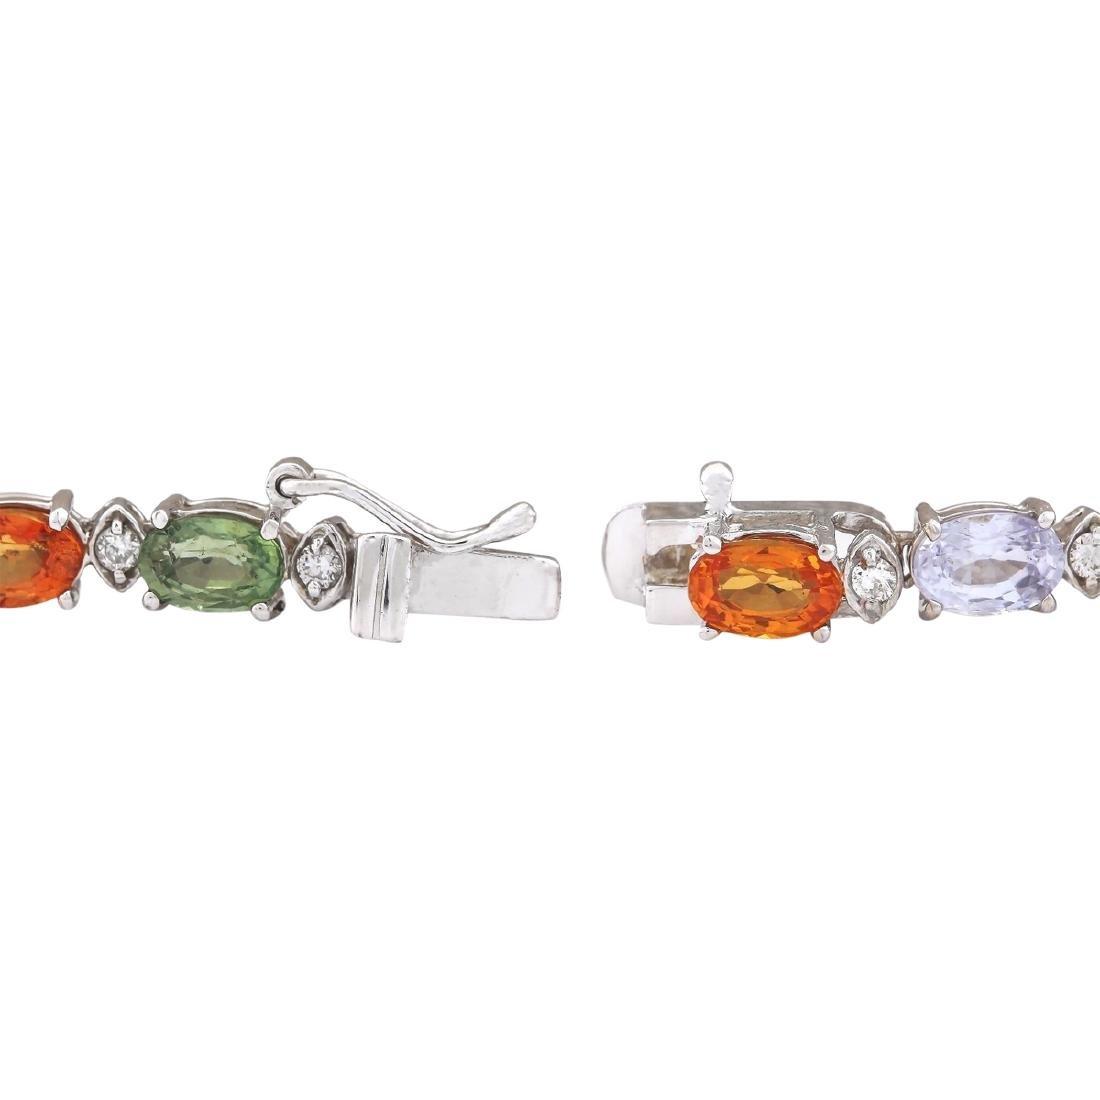 35.20 CTW Natural Ceylon Sapphire And Diamond Necklace - 3